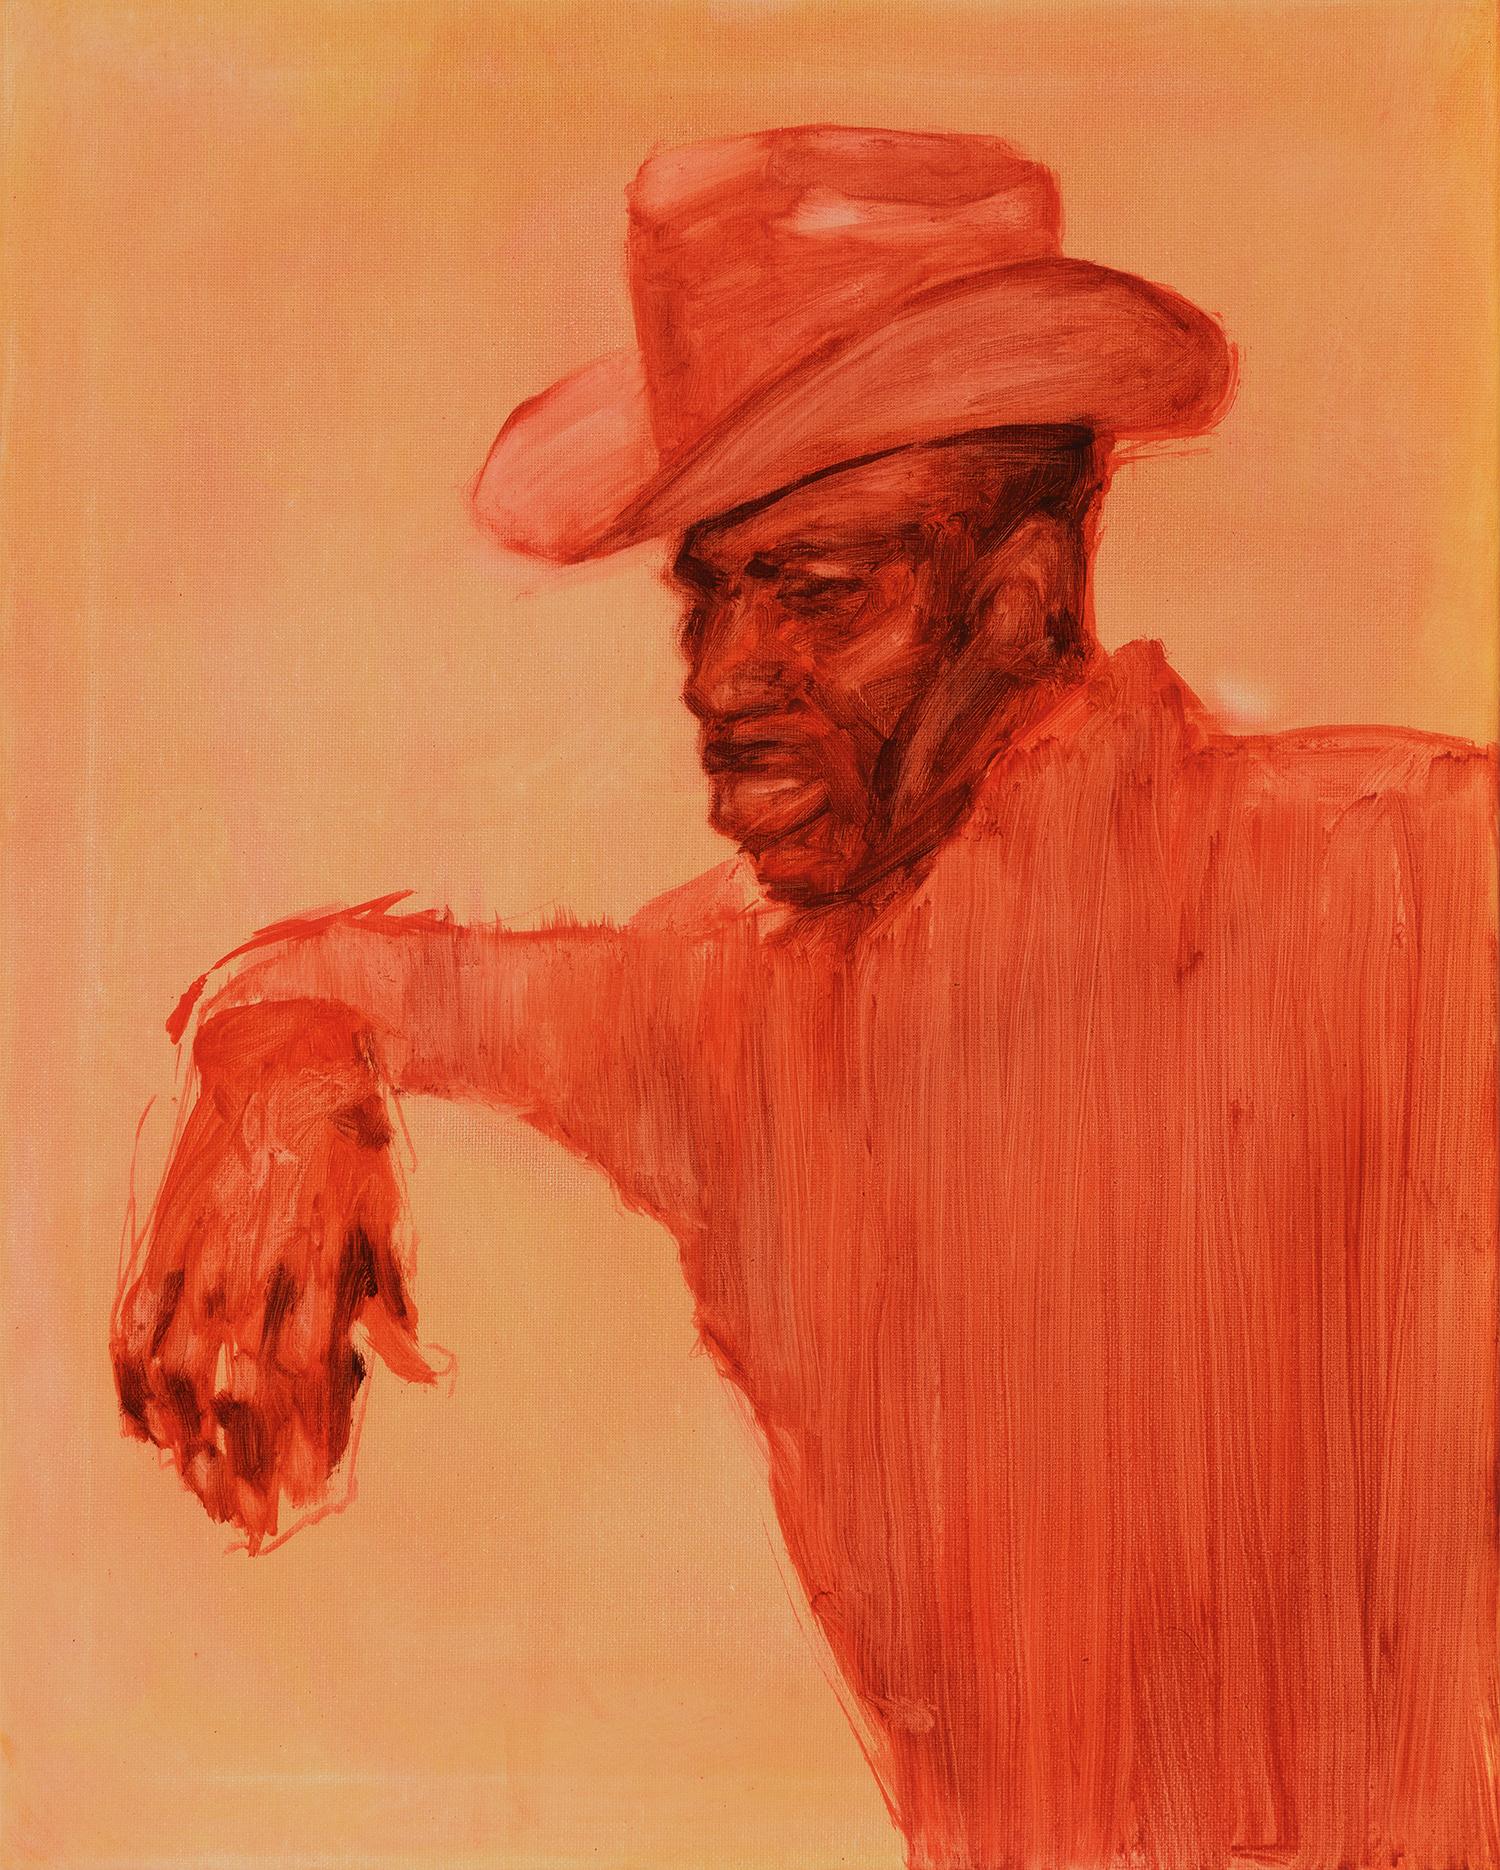 Myrtis, John Singletary, 2019, Oil on canvas, 16 x 20